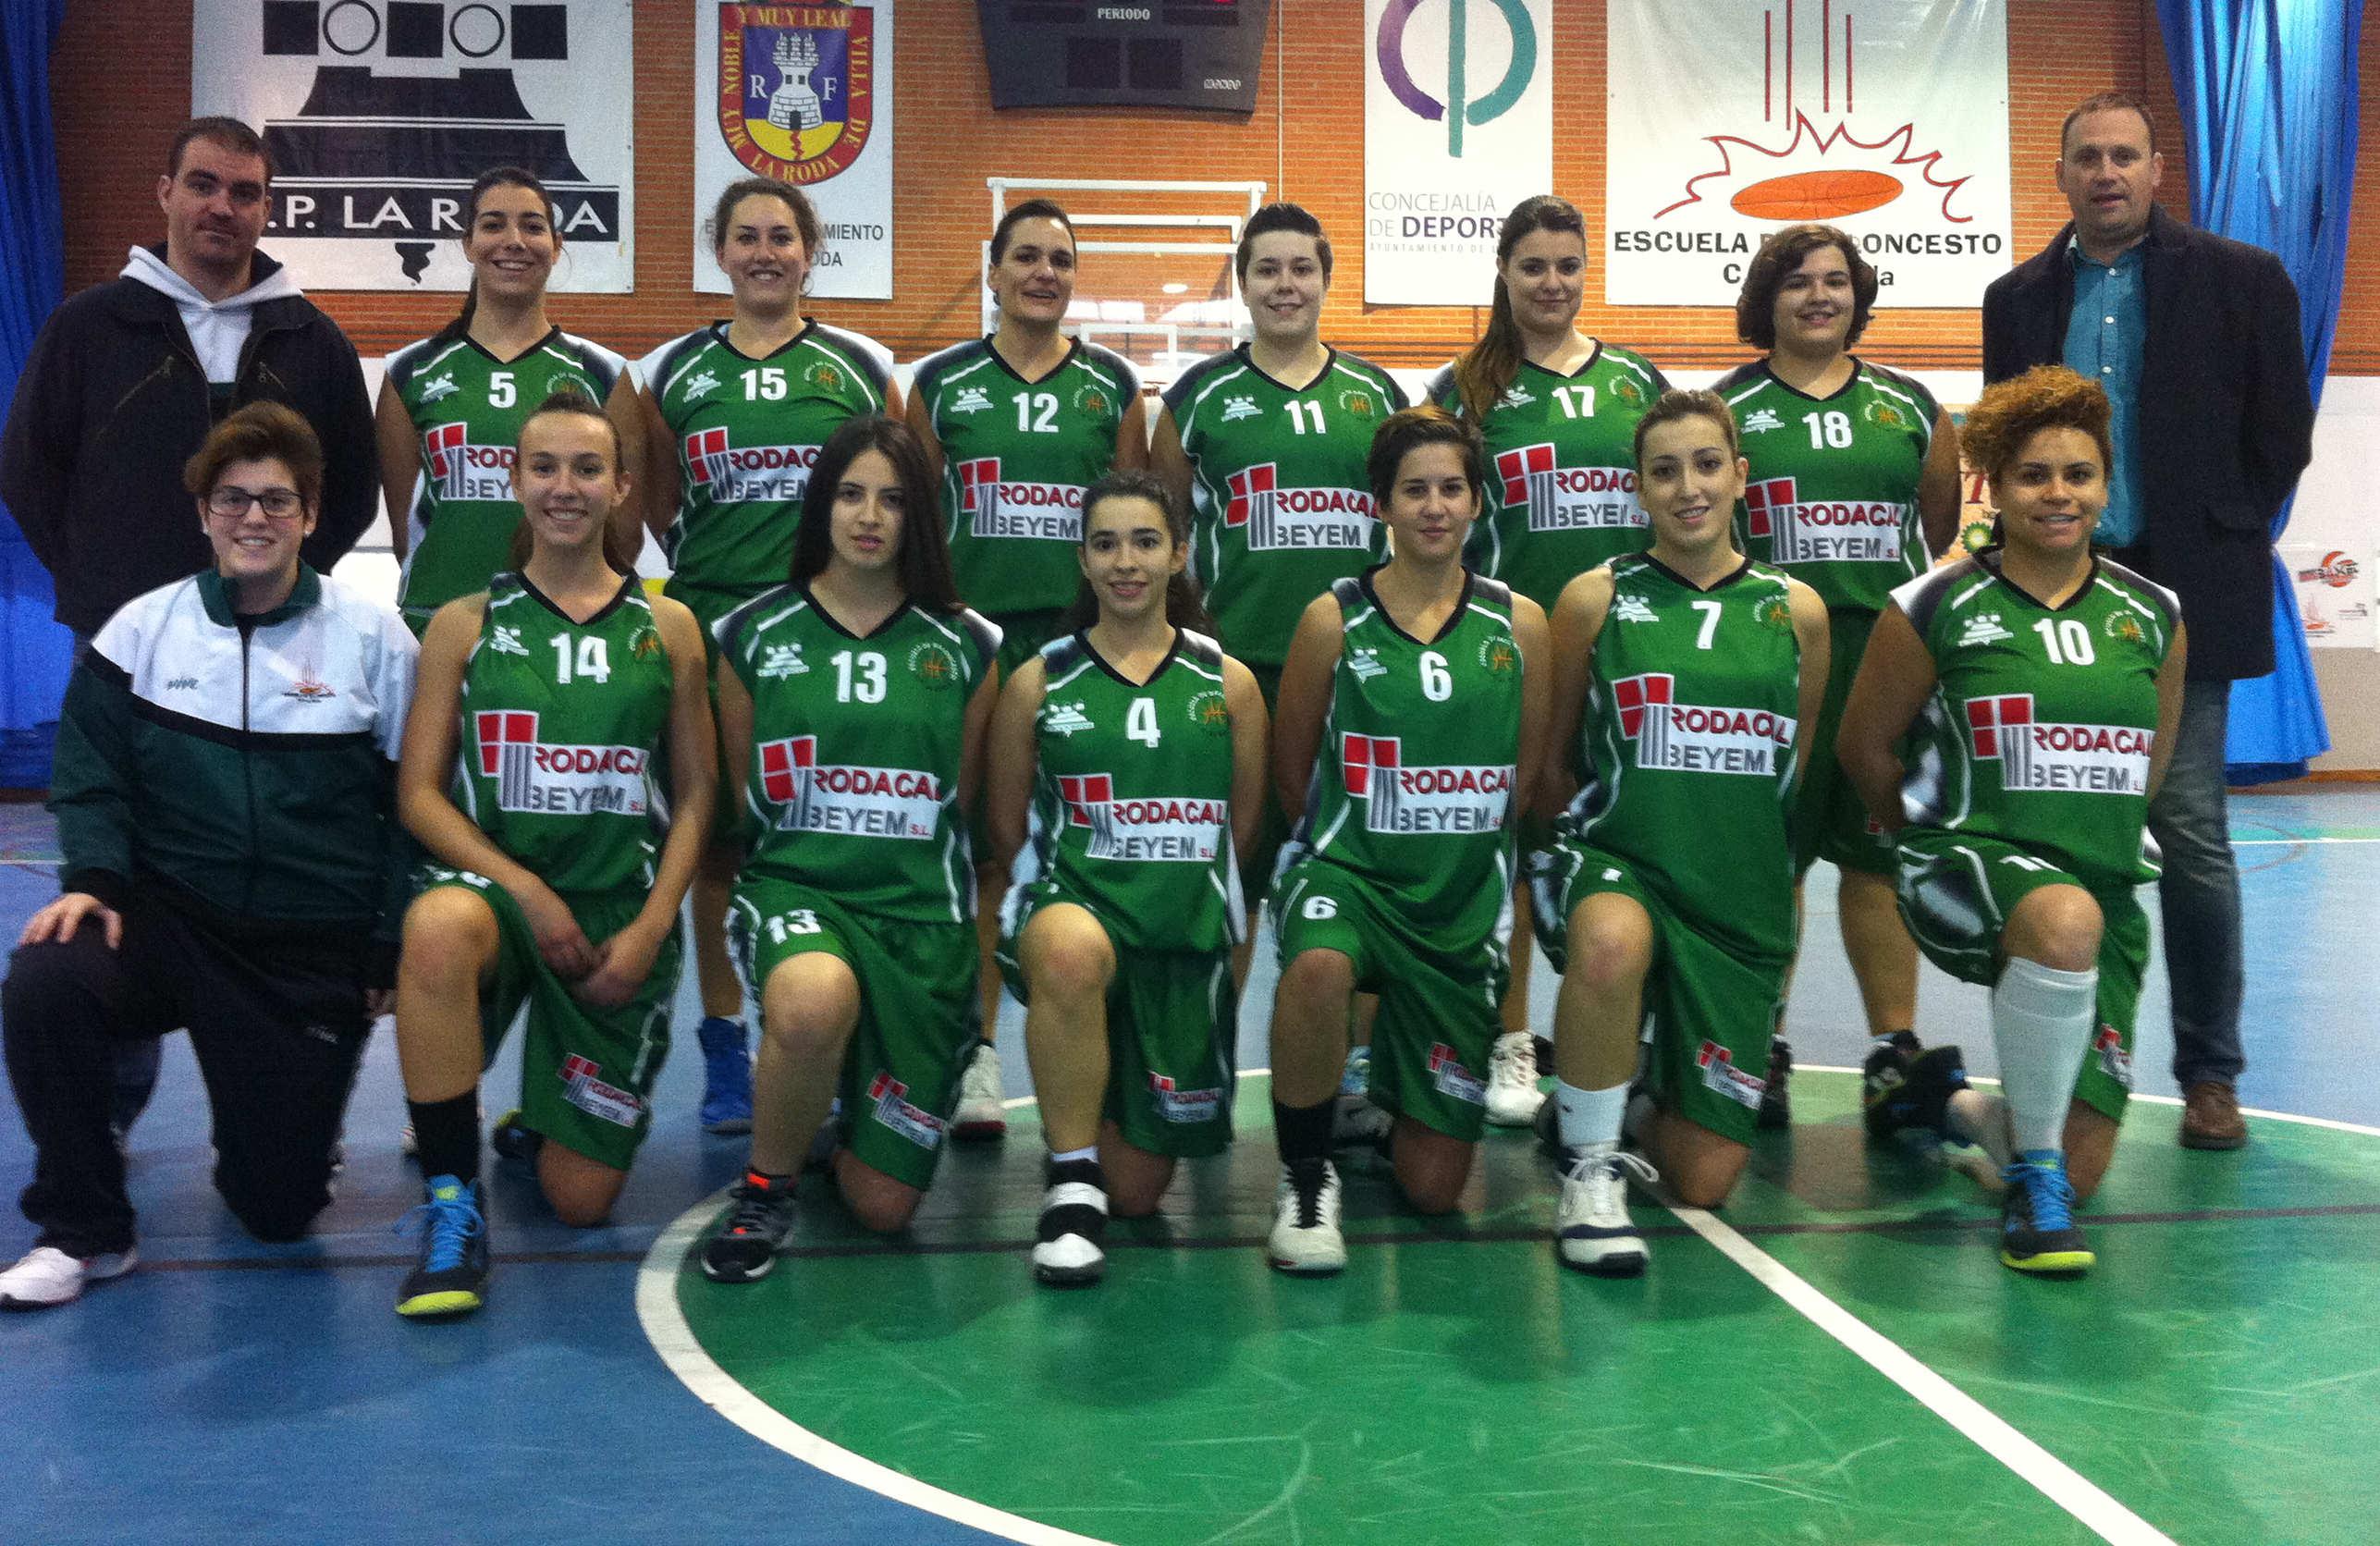 Rodacal Beyem CP La Roda temporada 2015-2016